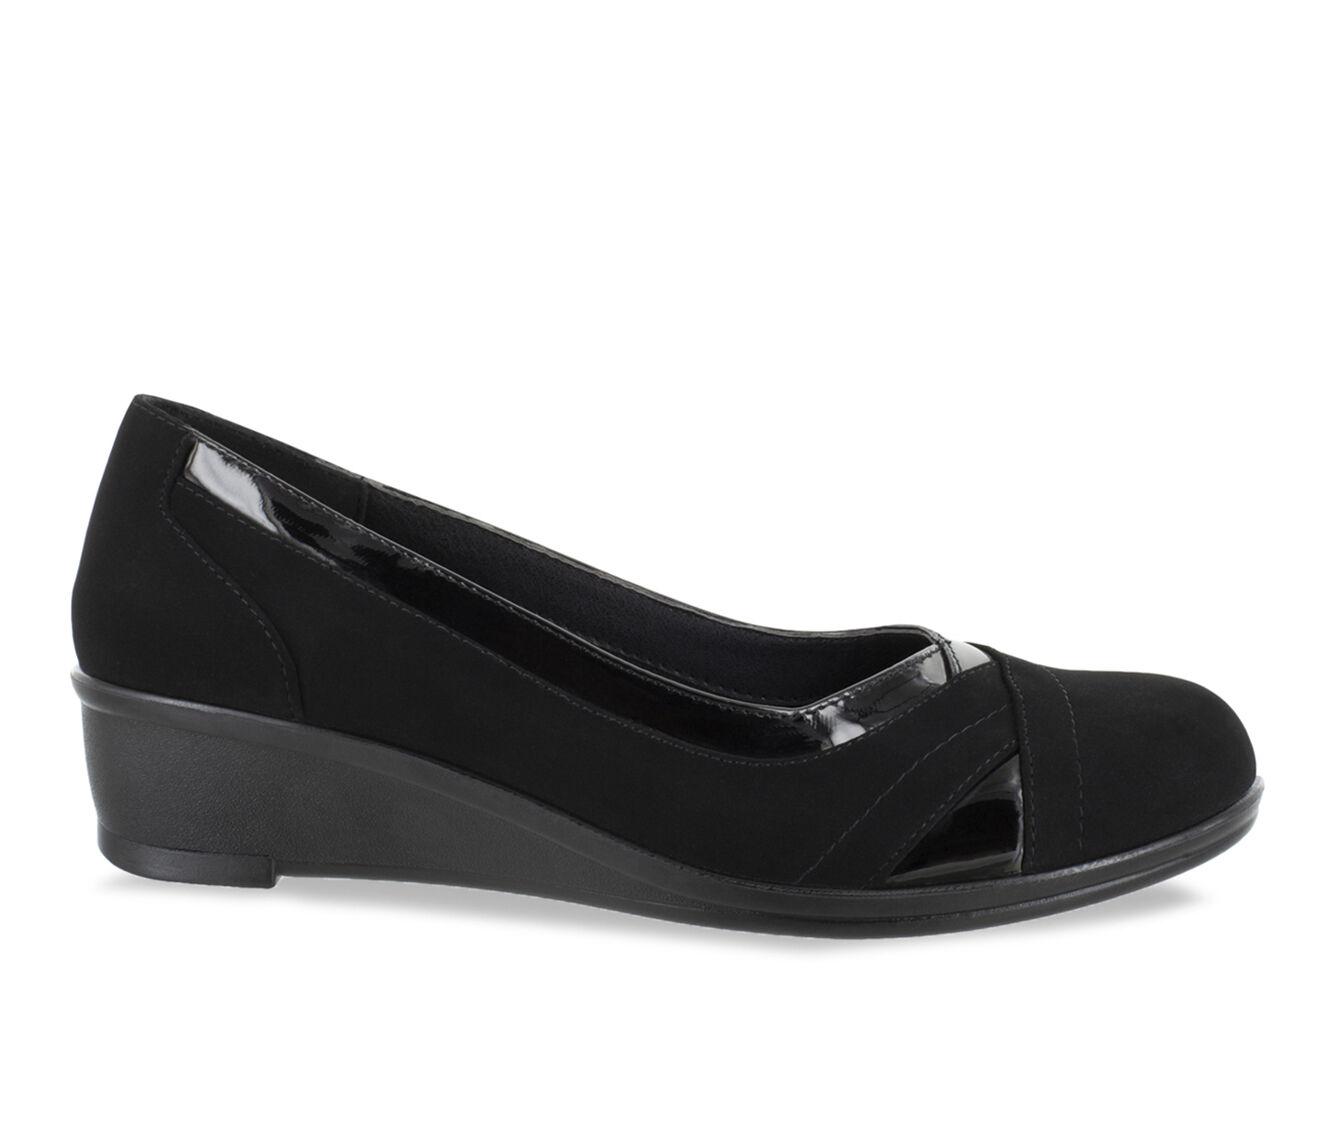 Women's Easy Street Dena Shoes Black Suede